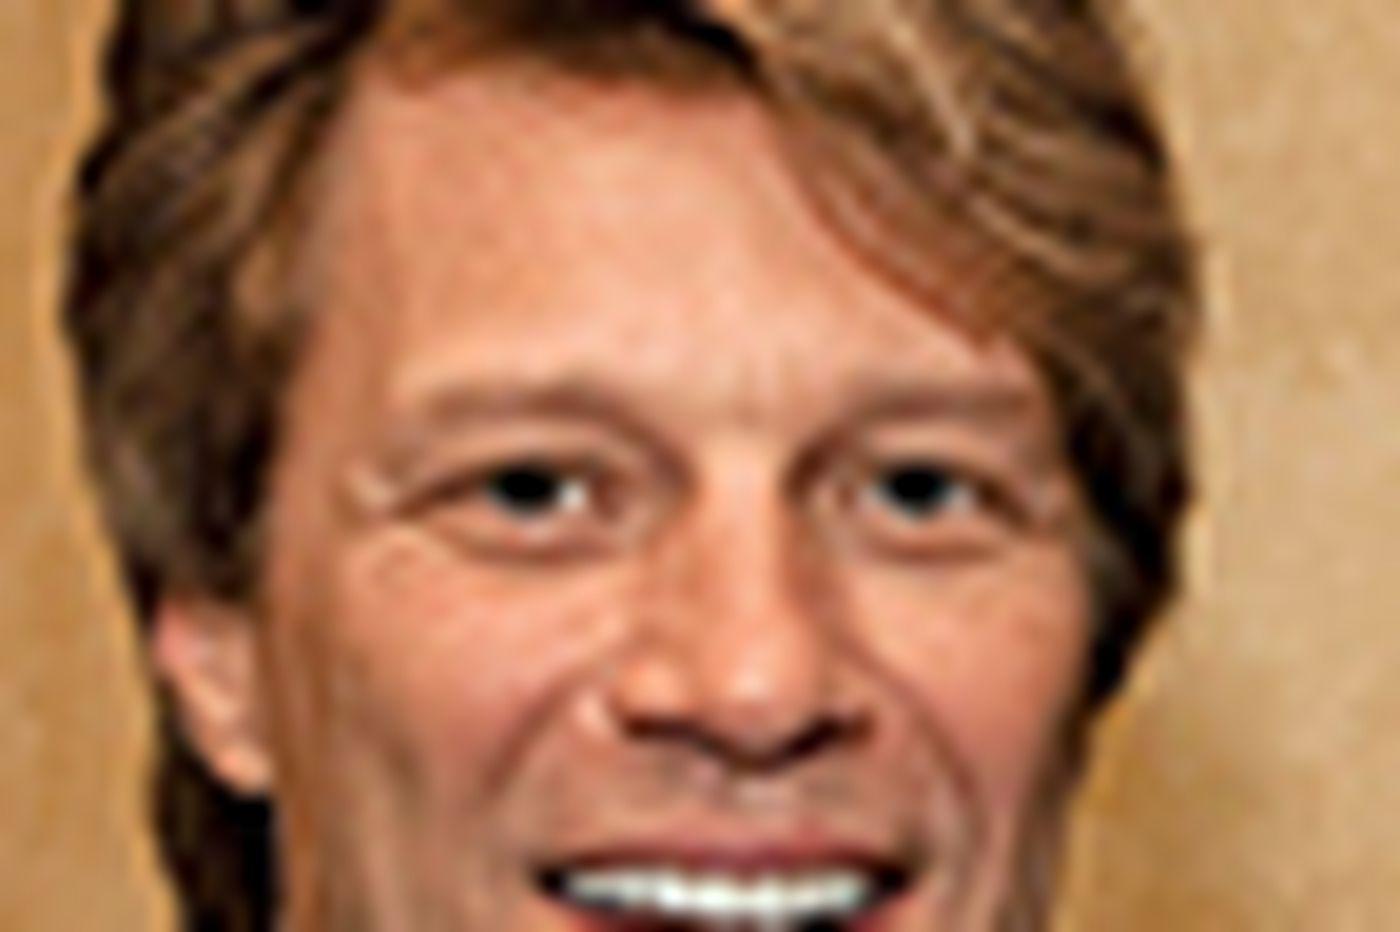 Jon Bon Jovi's charitable works to be honored at Heart of Camden gala